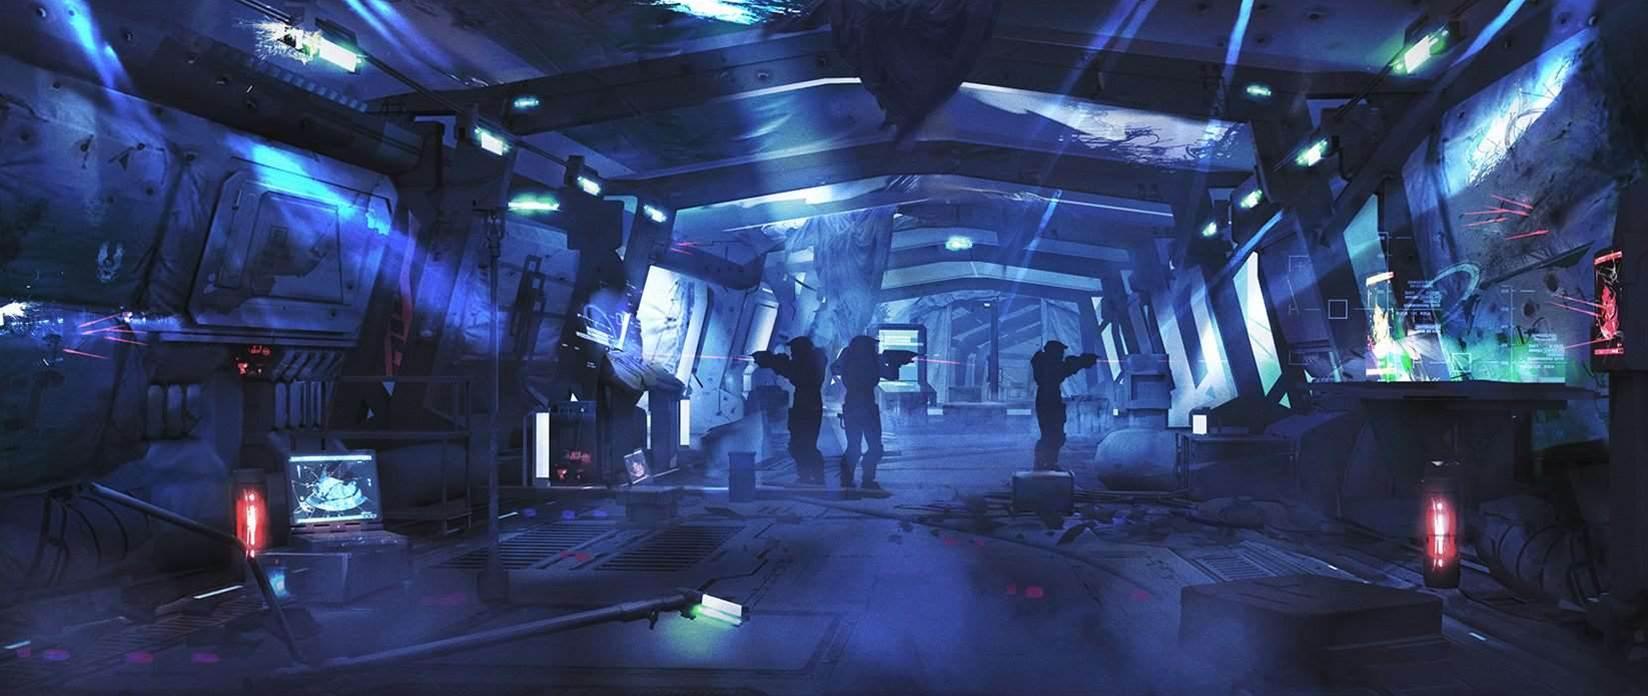 Halo Wars 2 screenshots and artwork